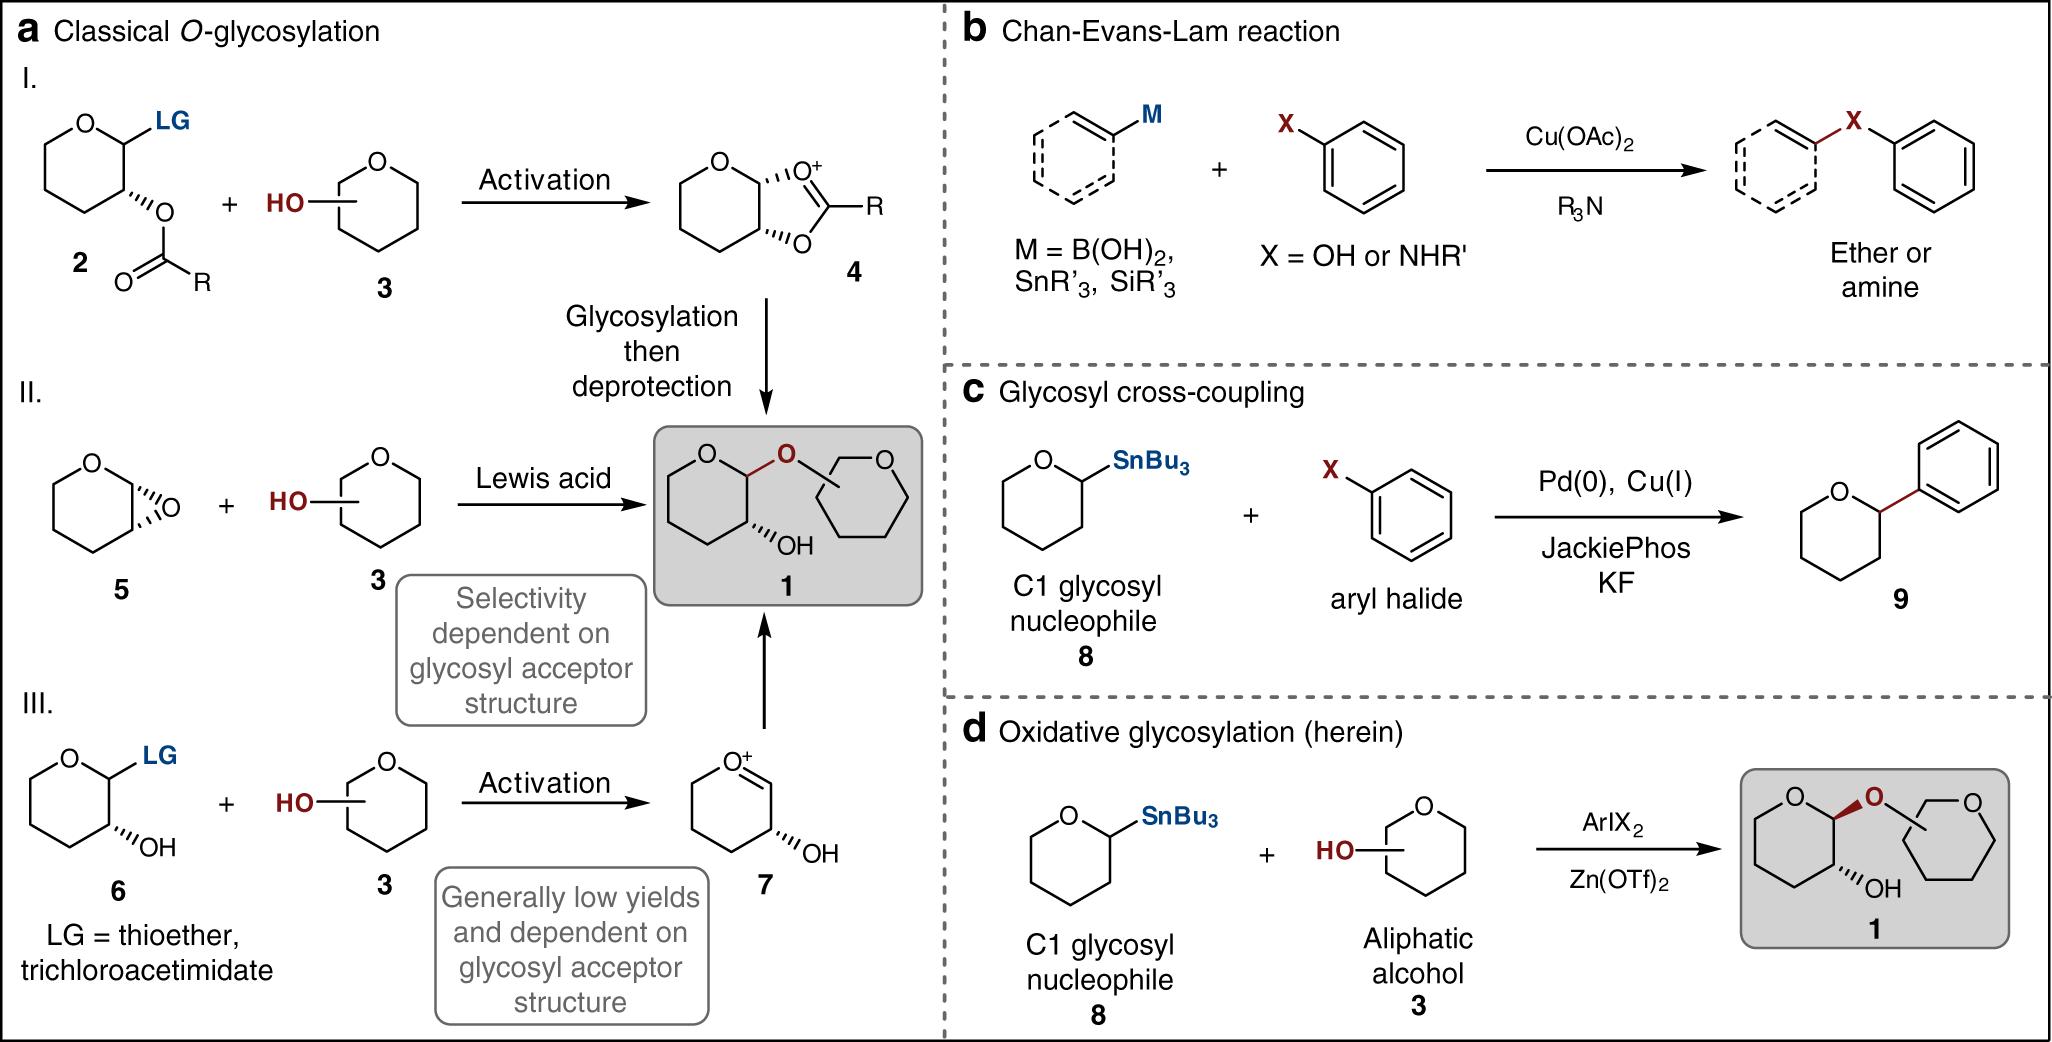 Stereoselective oxidative glycosylation of anomeric